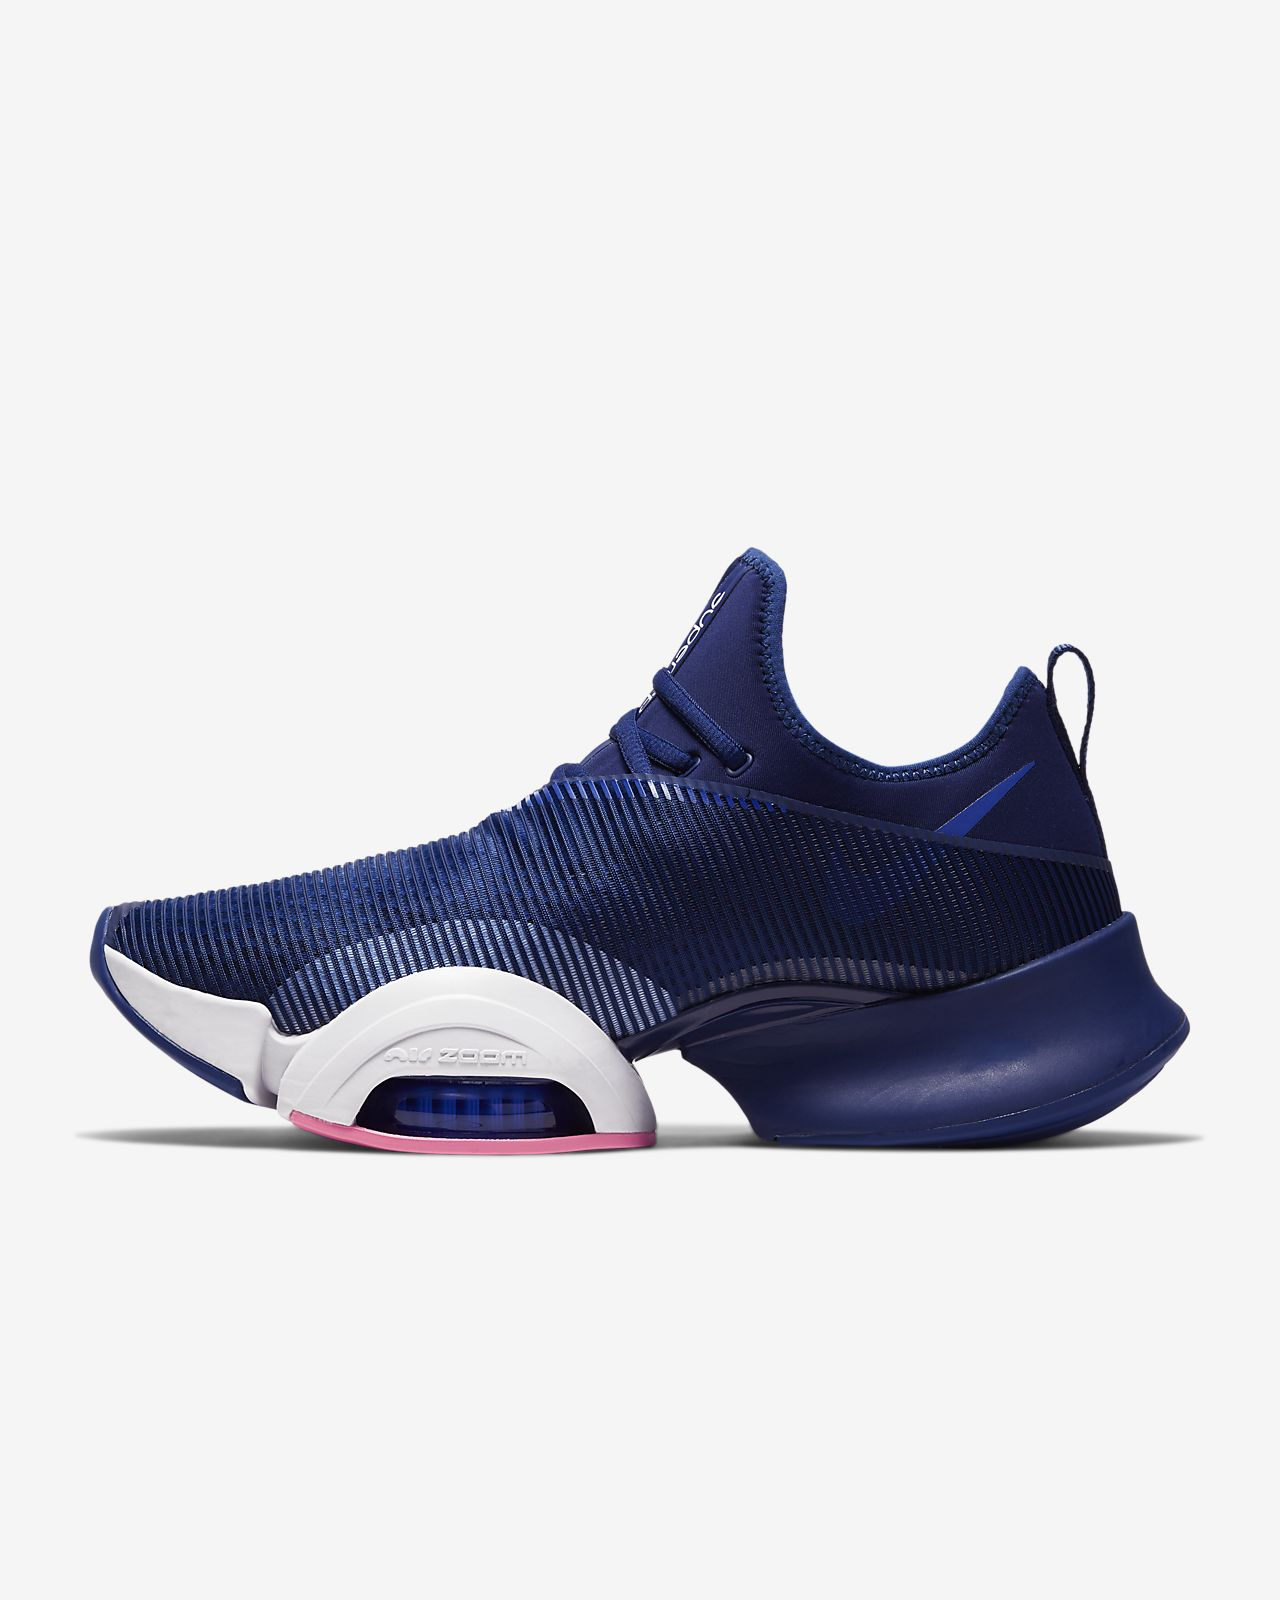 HIIT-sko Nike Air Zoom SuperRep för män